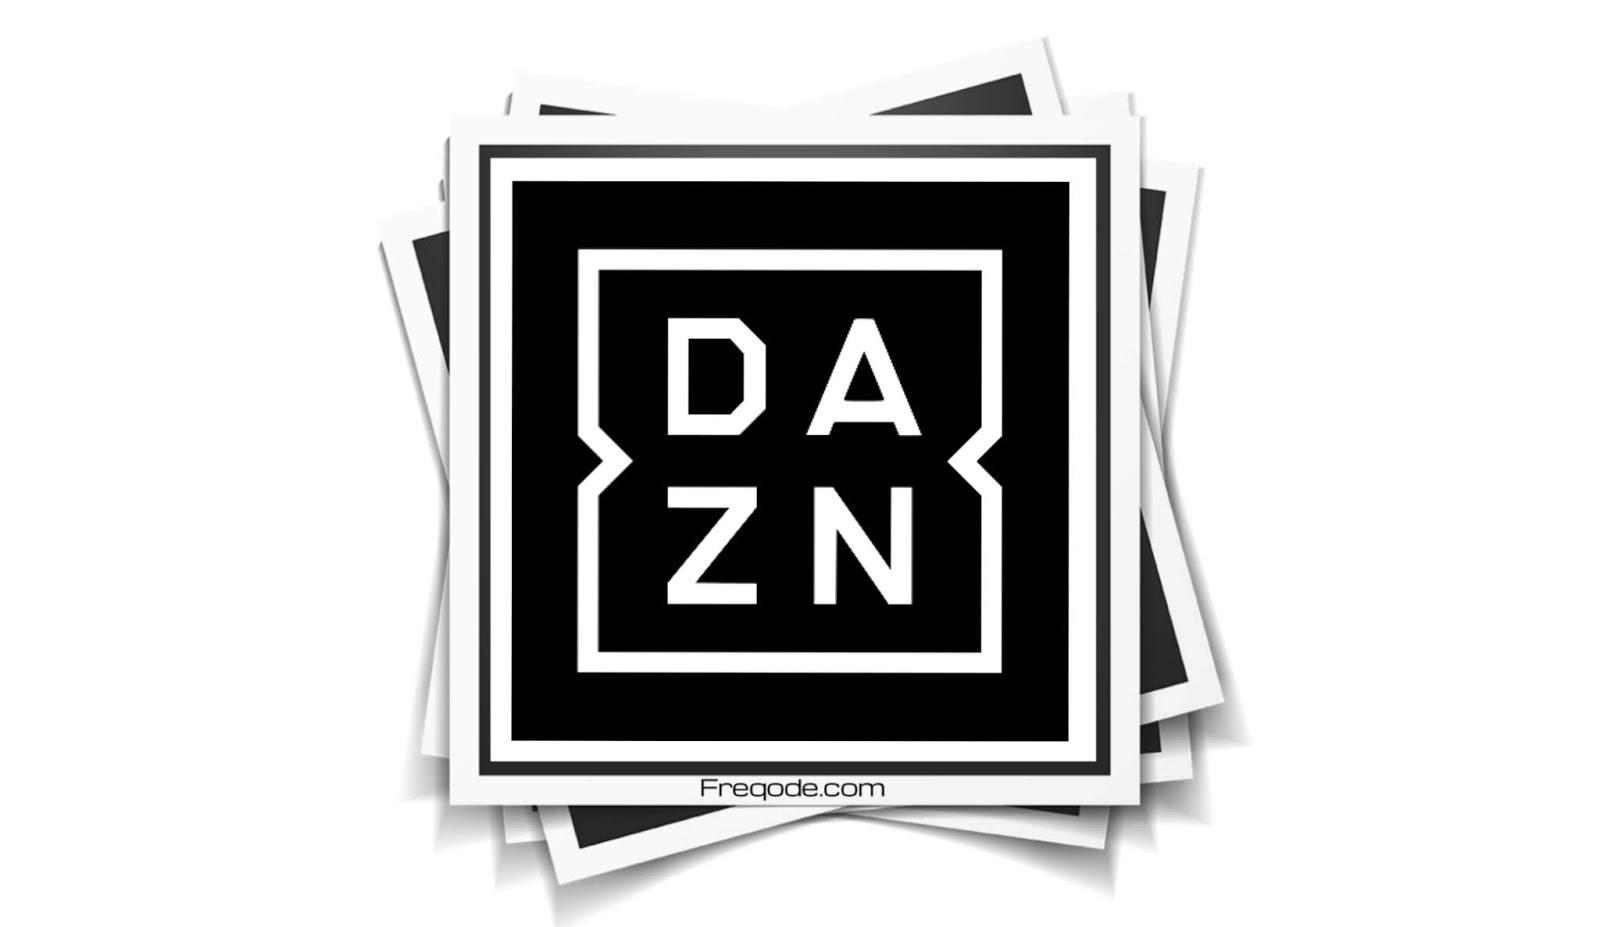 Dazn 1 Bar Hd